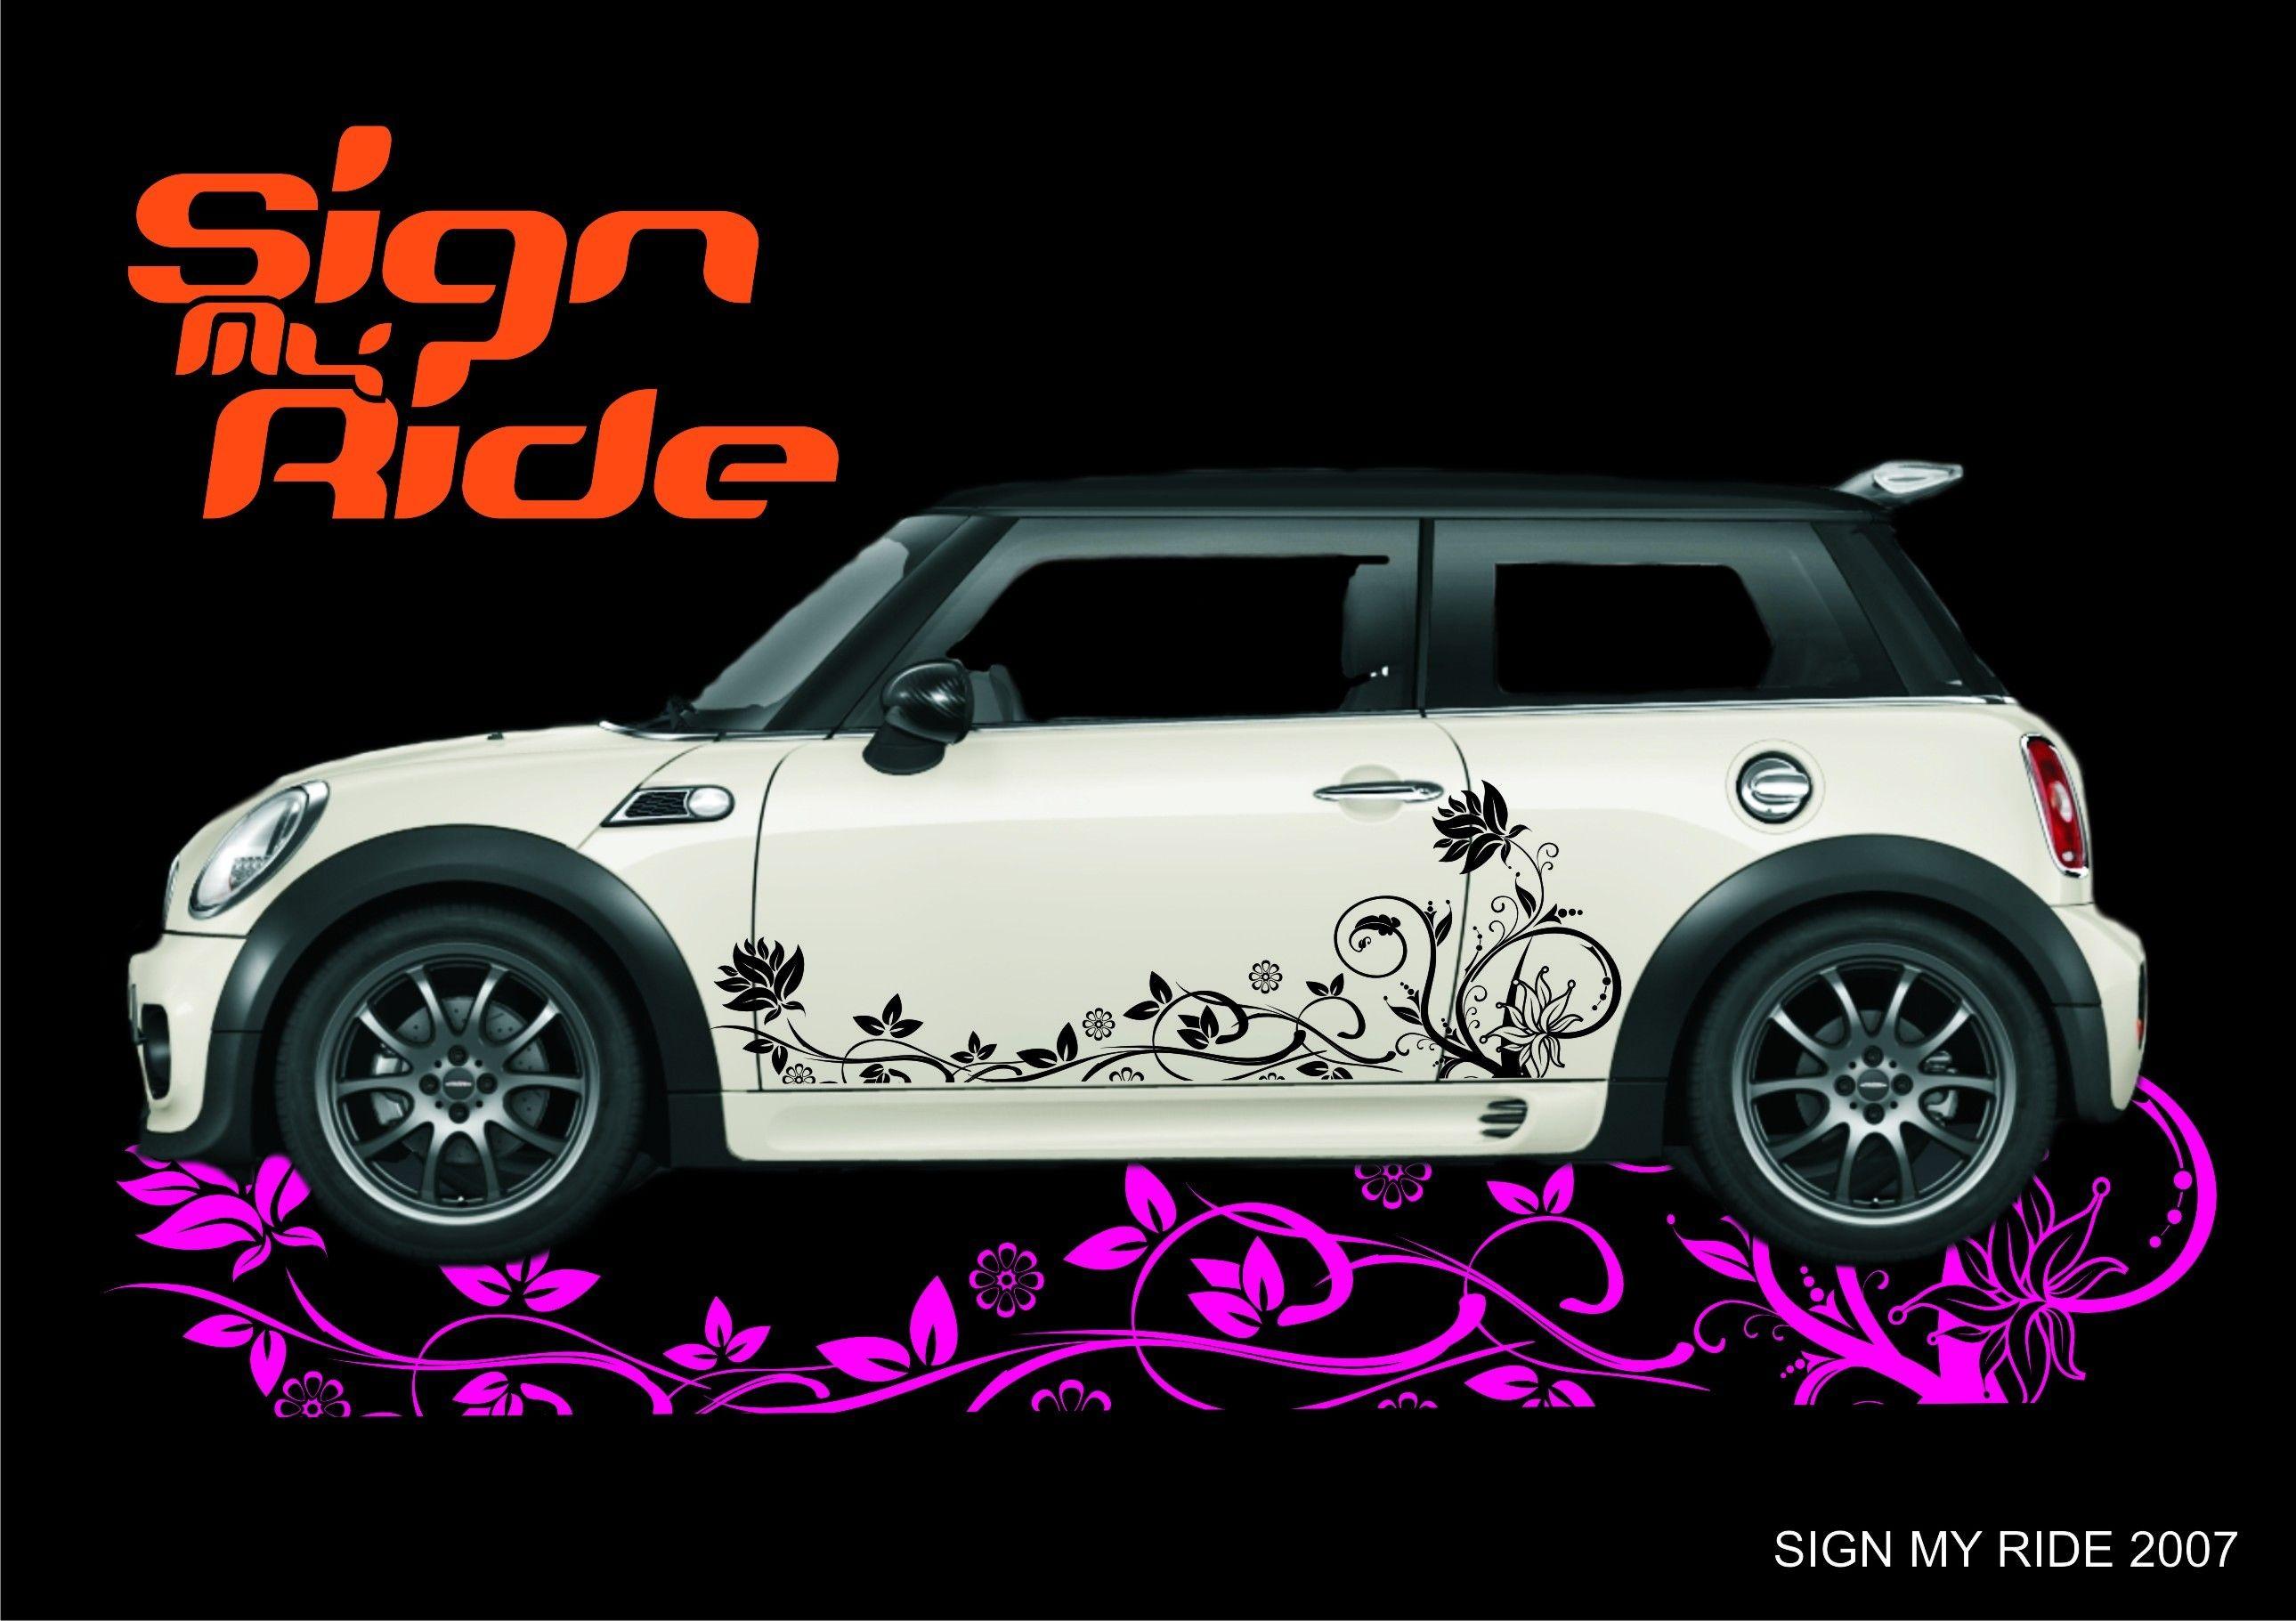 Car Side Stripes For Mini Cooper Car Decals Car Stickers Vinyl Racing Stripes